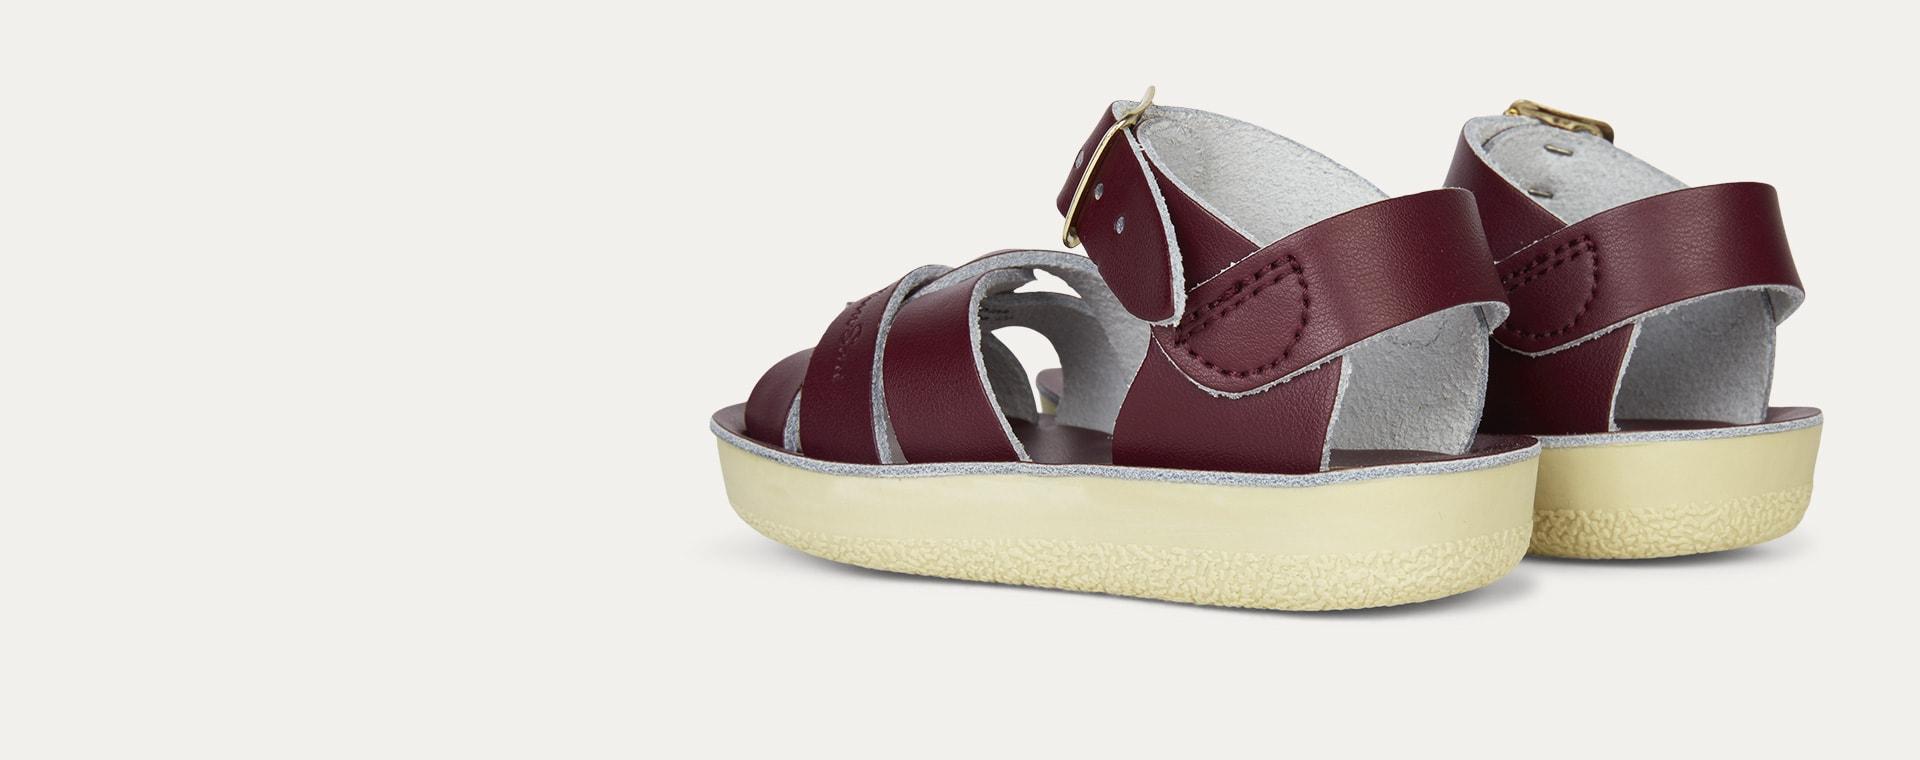 Claret Salt-Water Sandals Swimmer Sandal